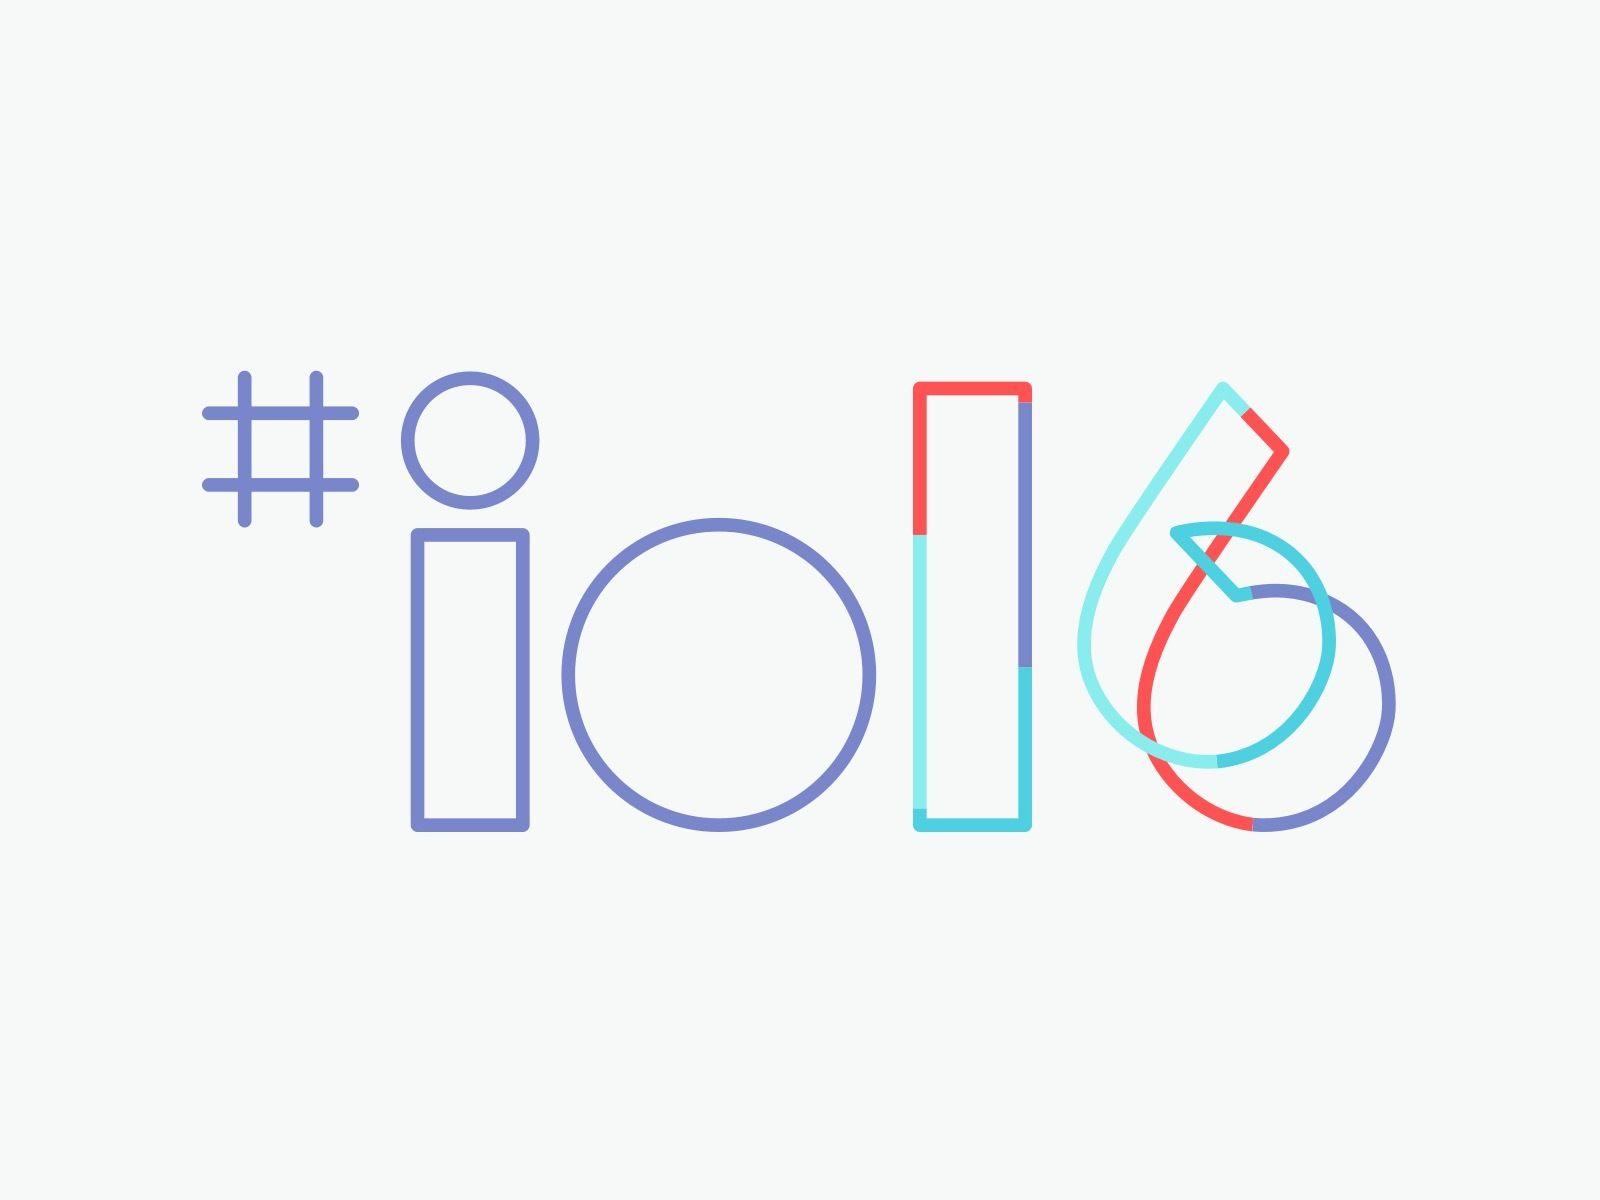 I/O 第一天,Google 发布了自家的 Siri、Skype、WhatsApp 和 Echo   极客早知道 2016 年 5 月 19 日